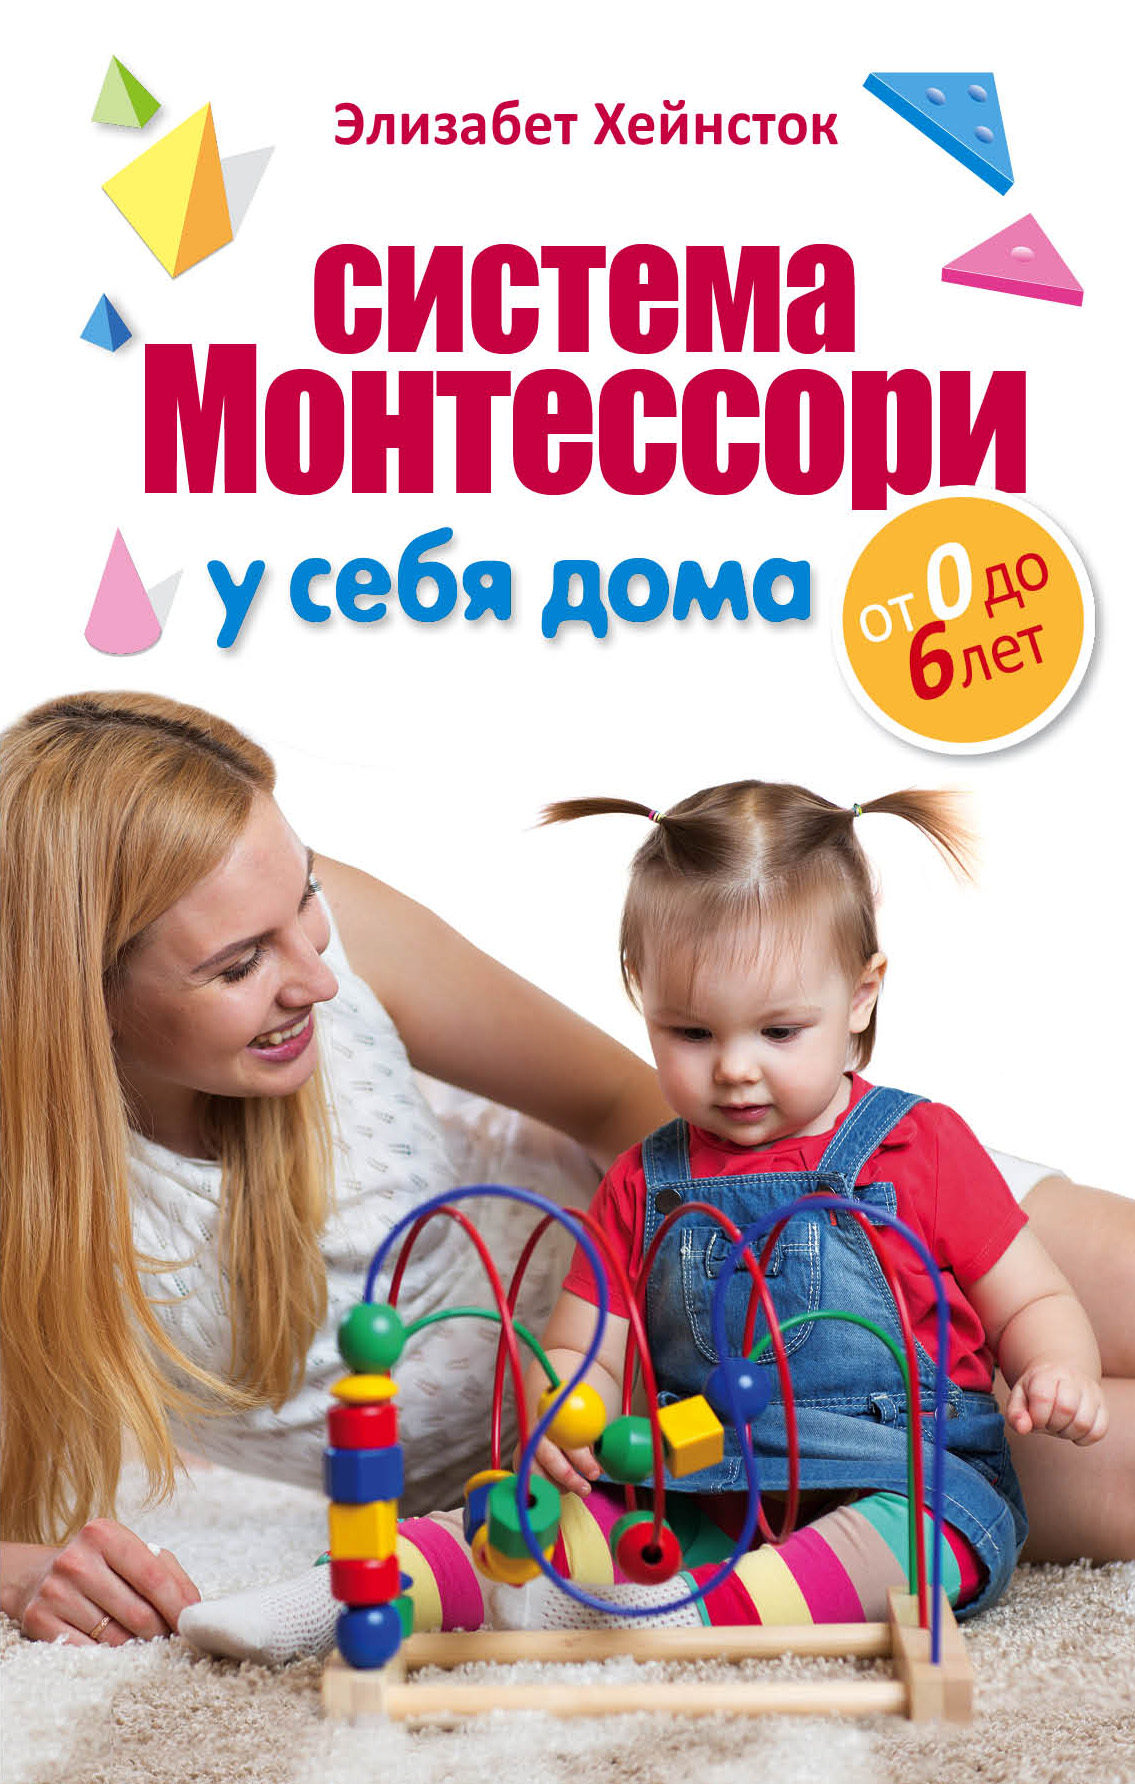 Система Монтессори у себя дома : от 0 до 6 лет